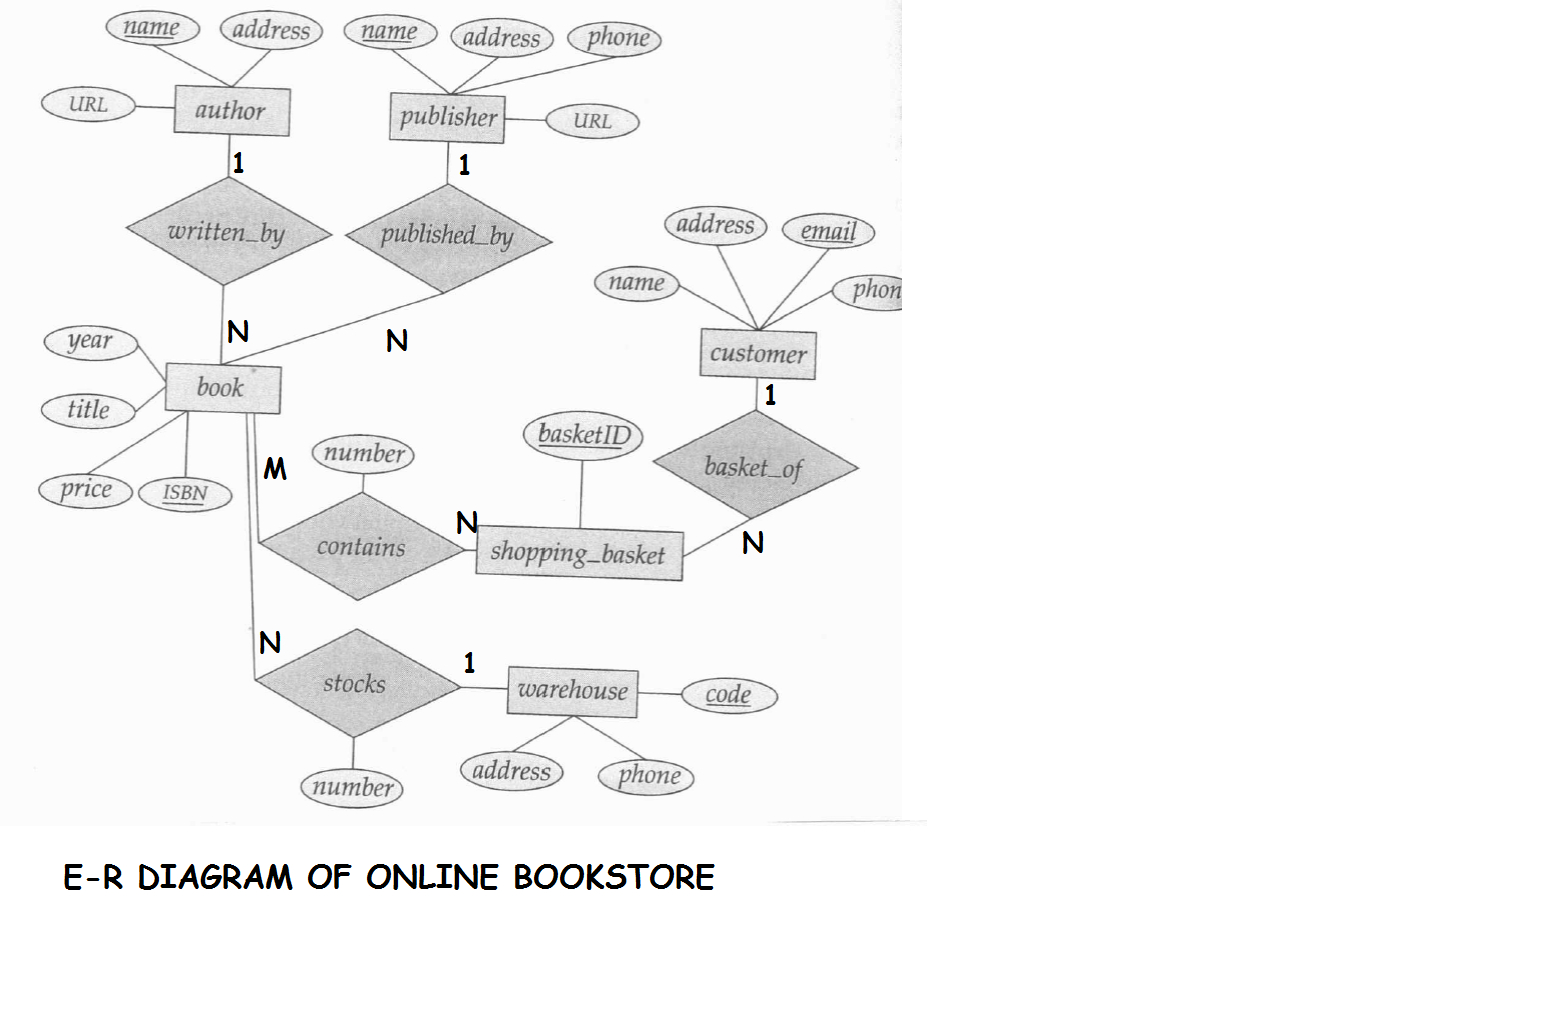 E-R Diagram For Online Bookstore(Roll N0-3,s5 Cs2) | Lbs inside Entity Diagram Online